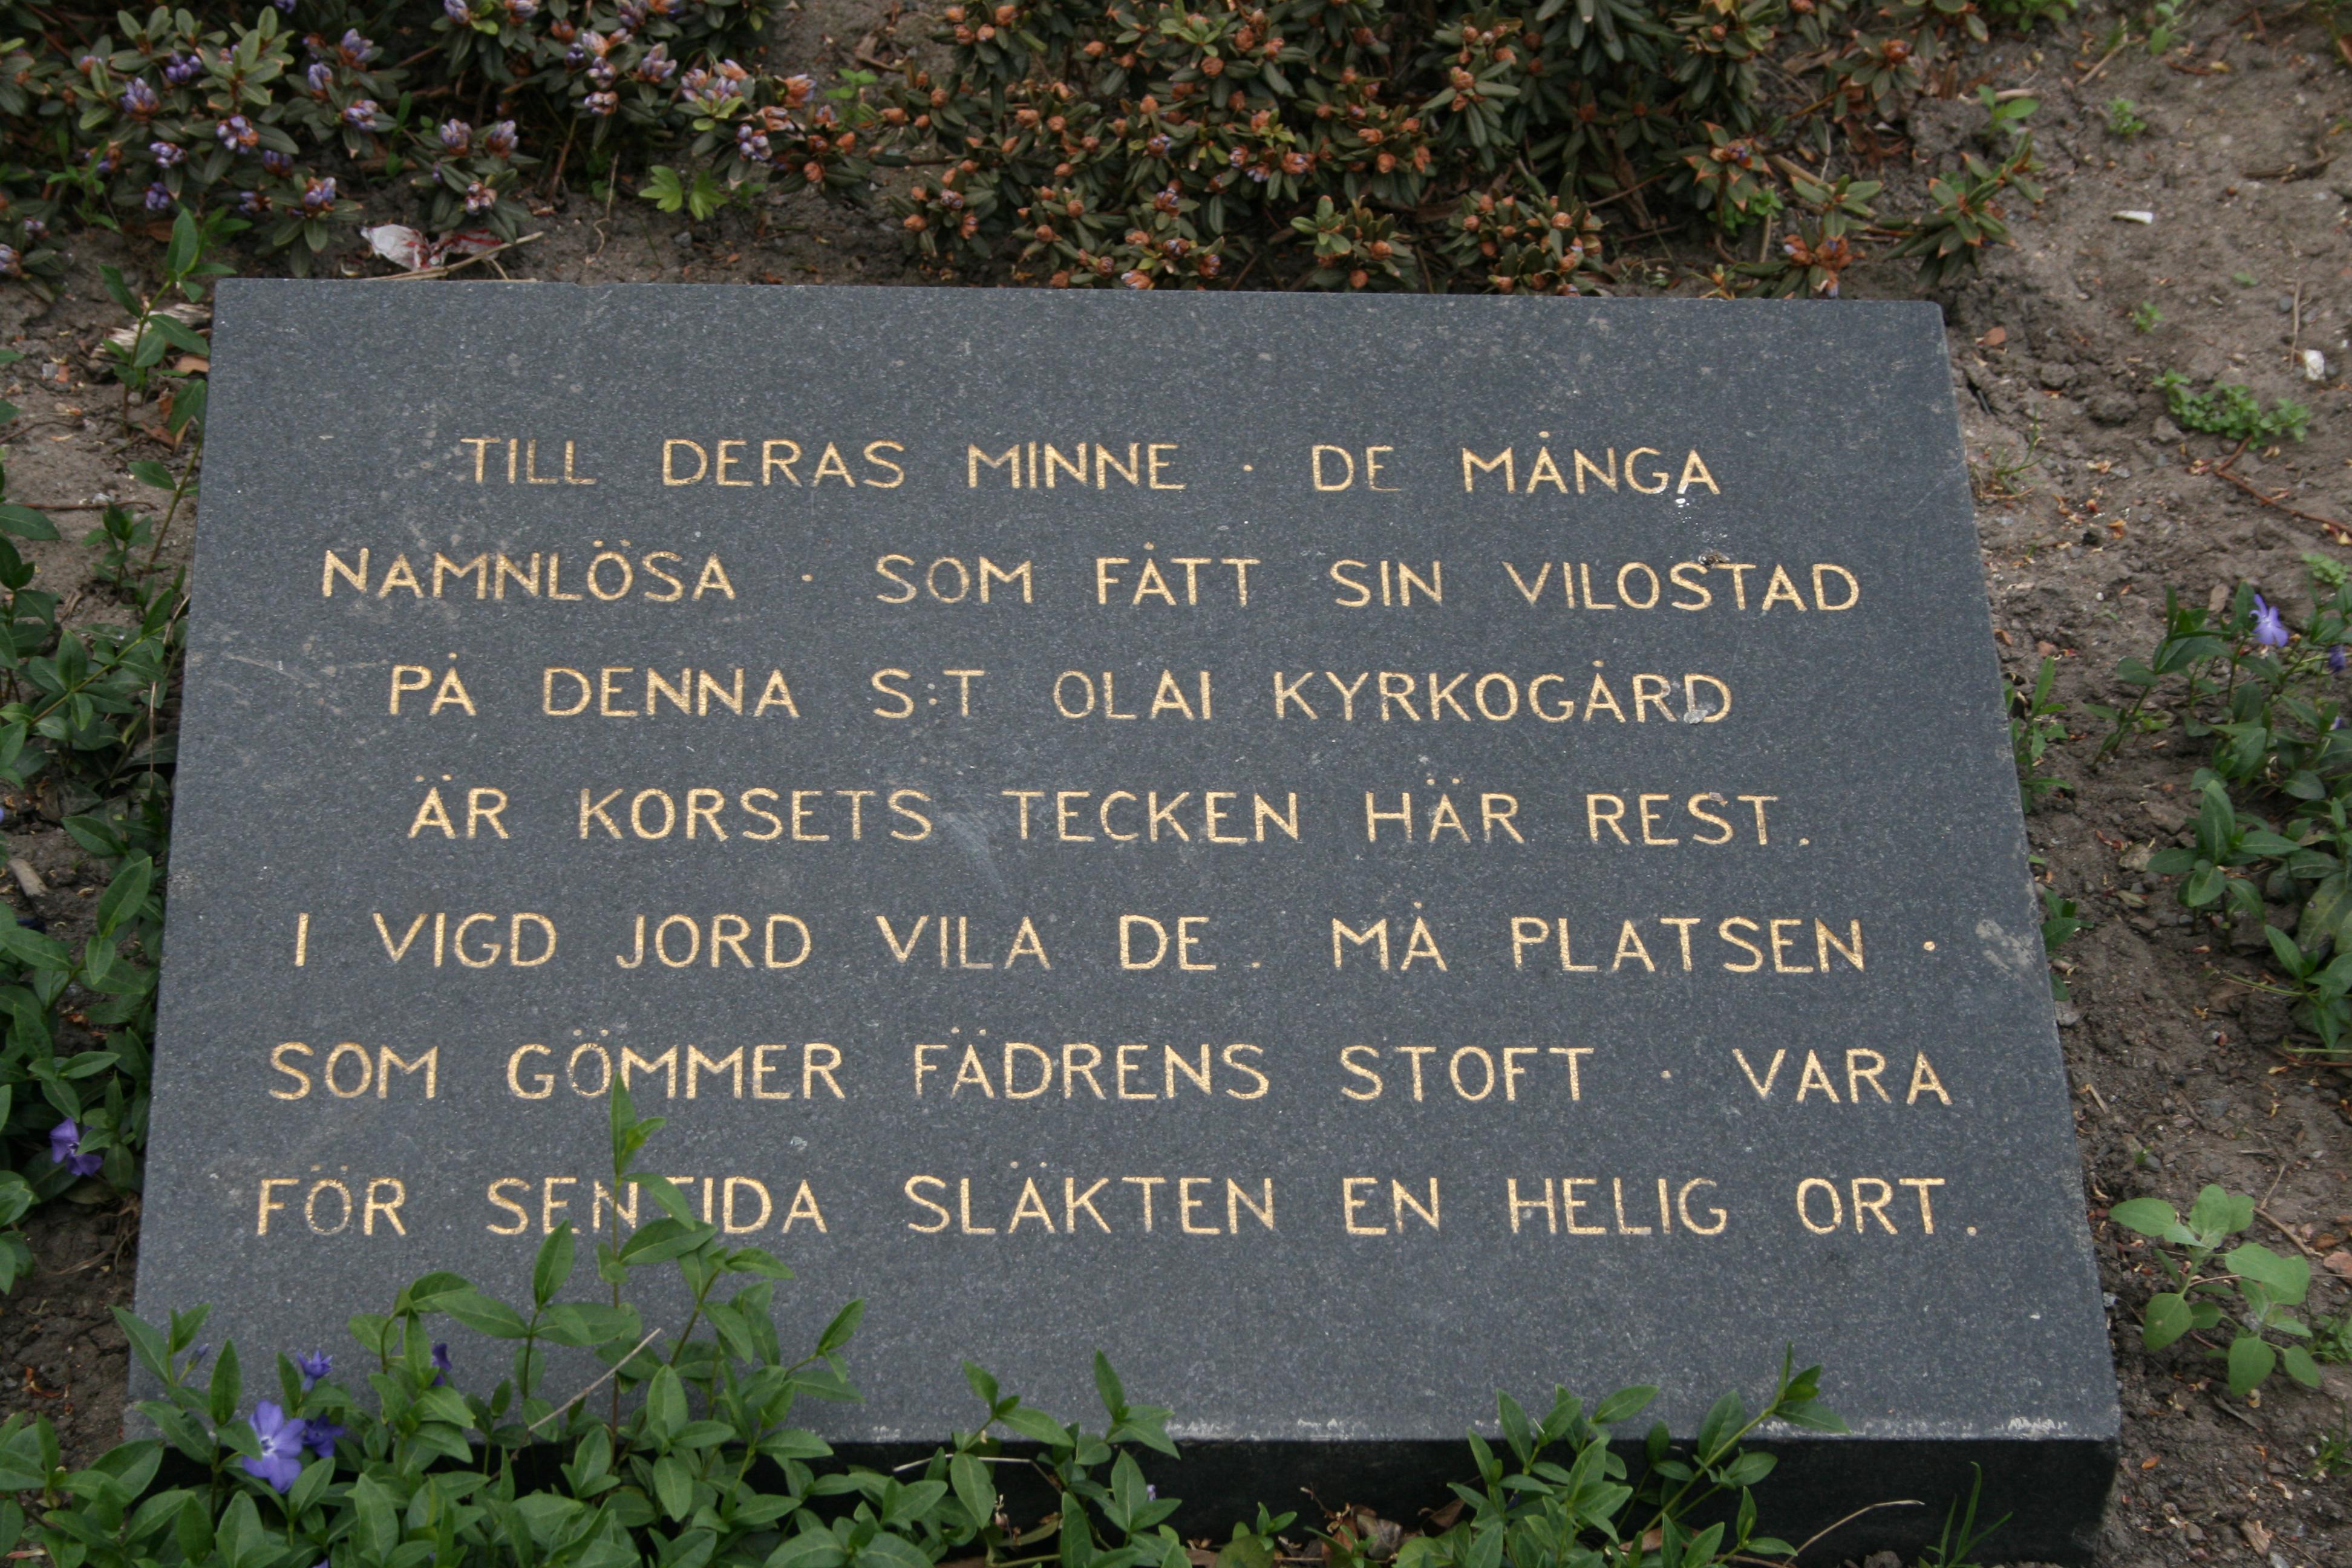 Fil:Sankt Olai kyrka i Norrkping, den stora - Wikipedia